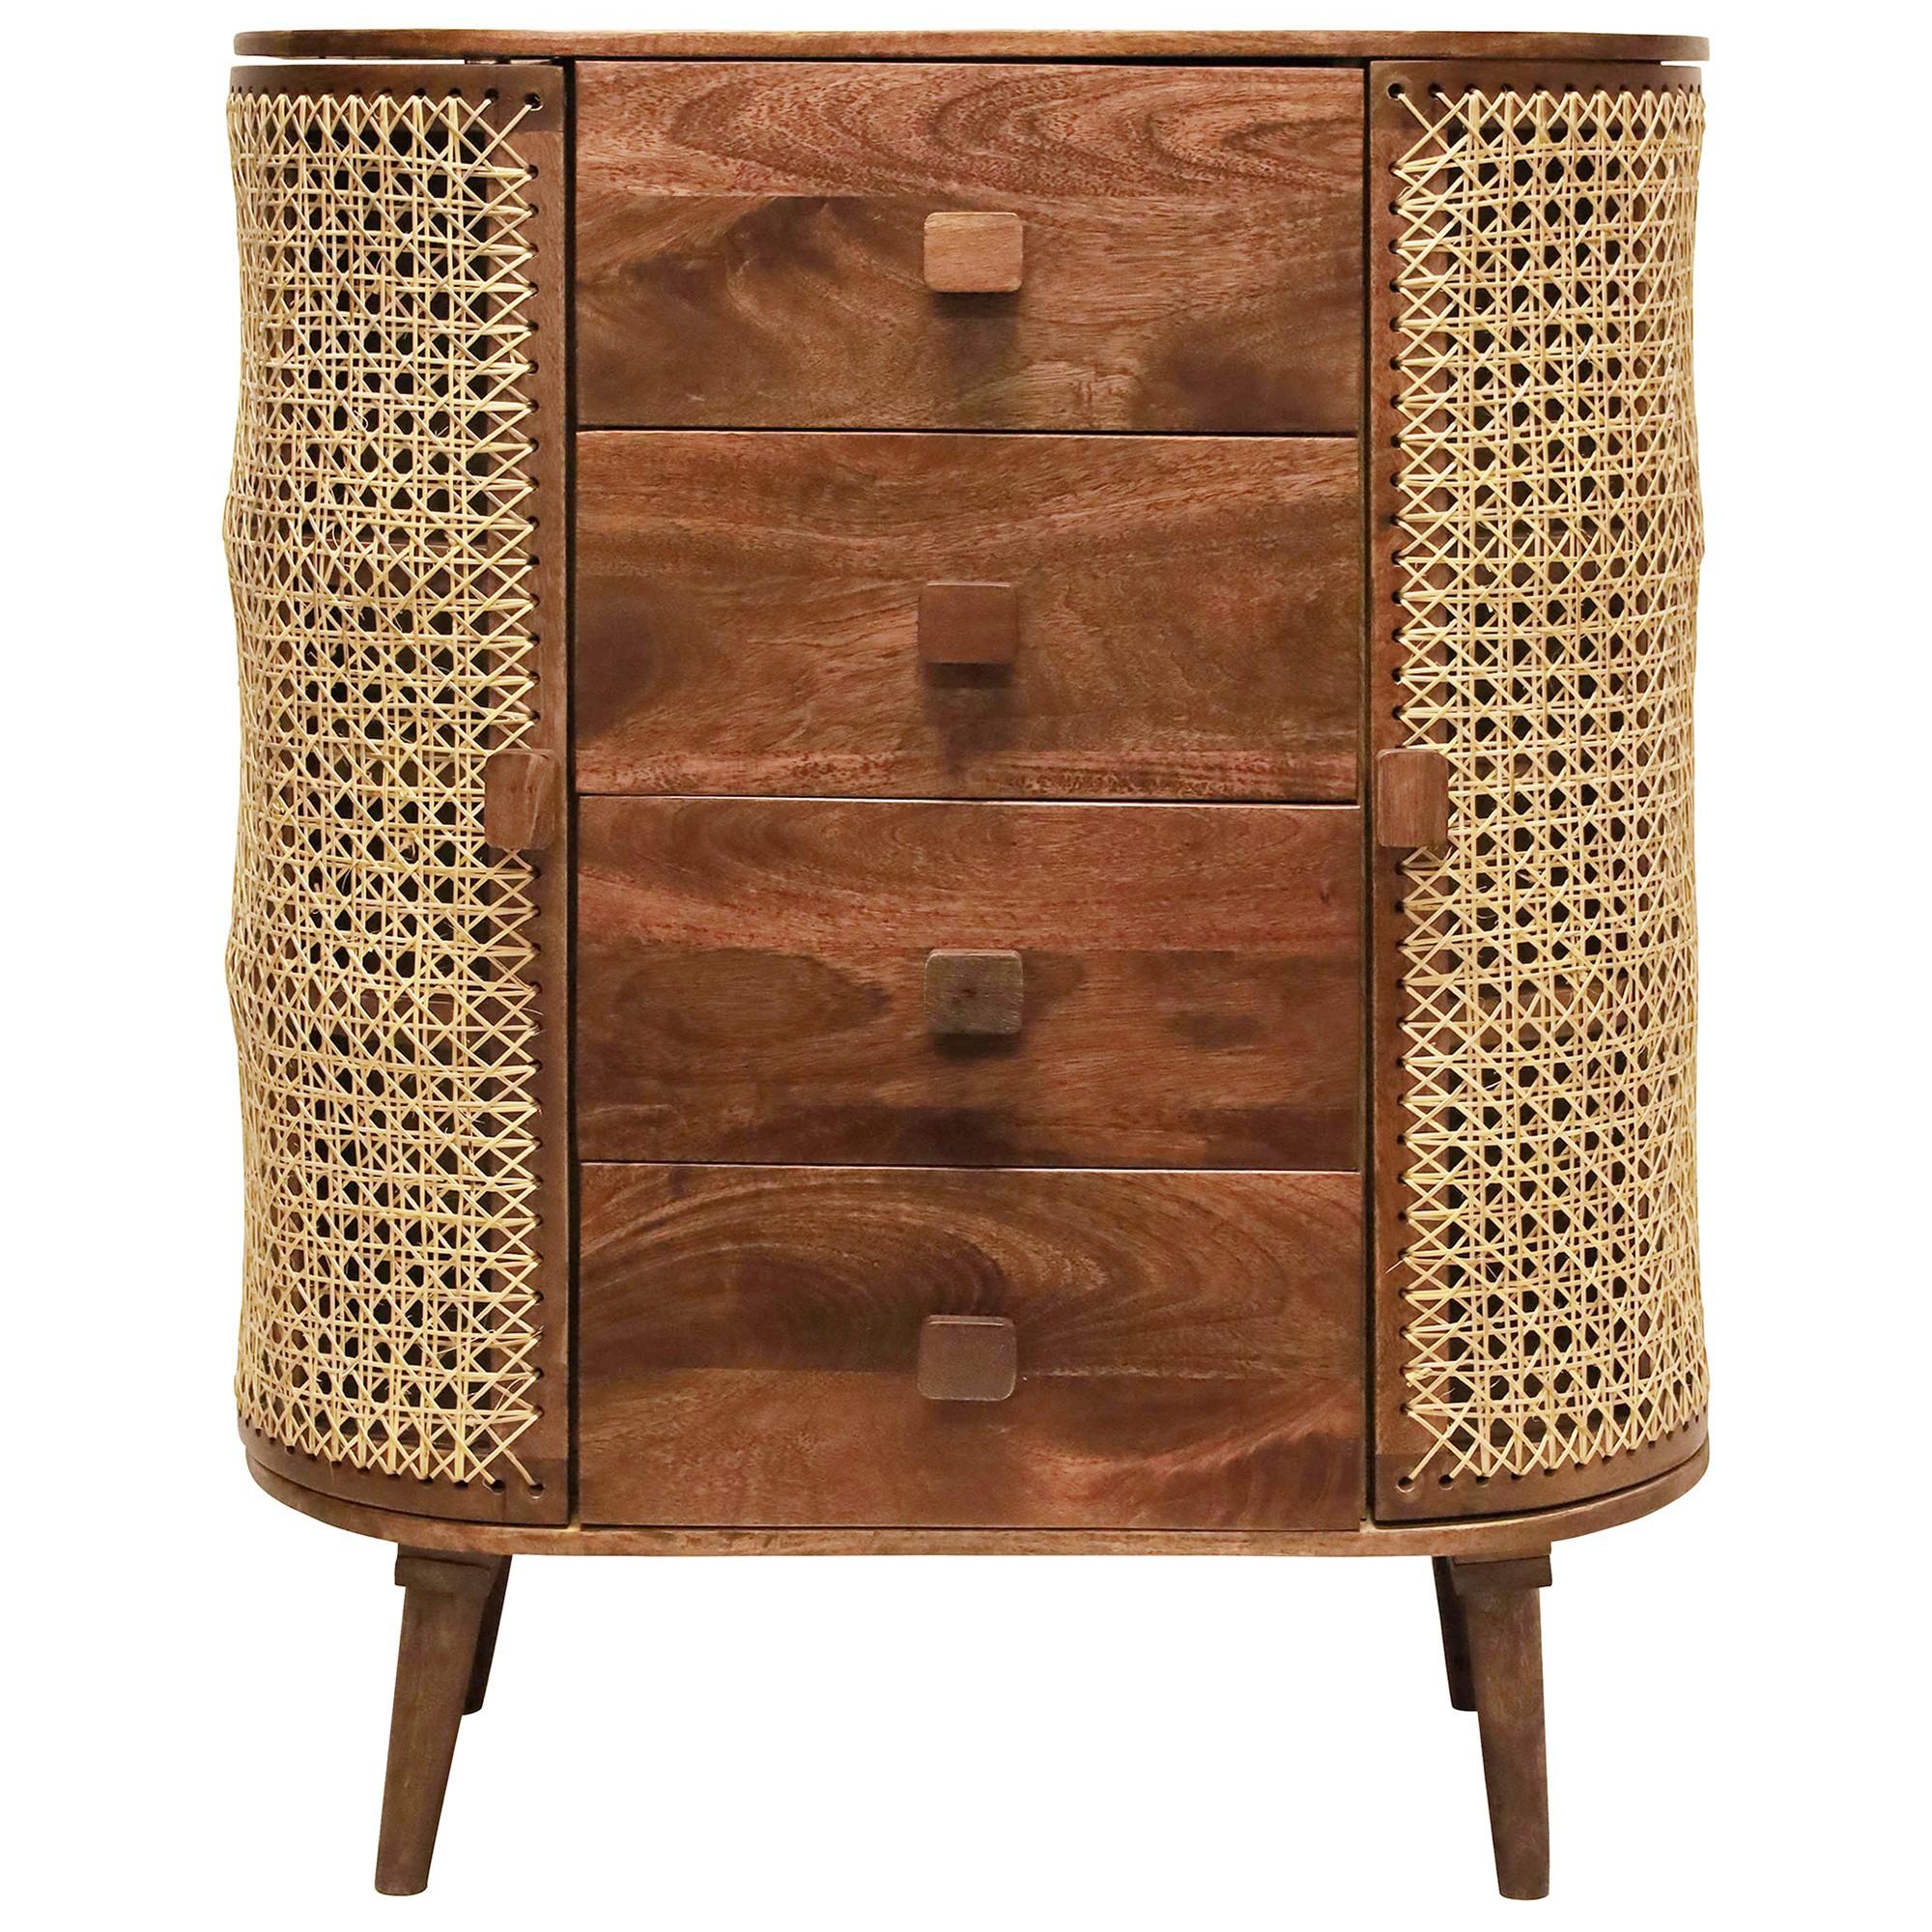 Sirocco Mango Wood & Cane 4 Drawer 2 Door Chest